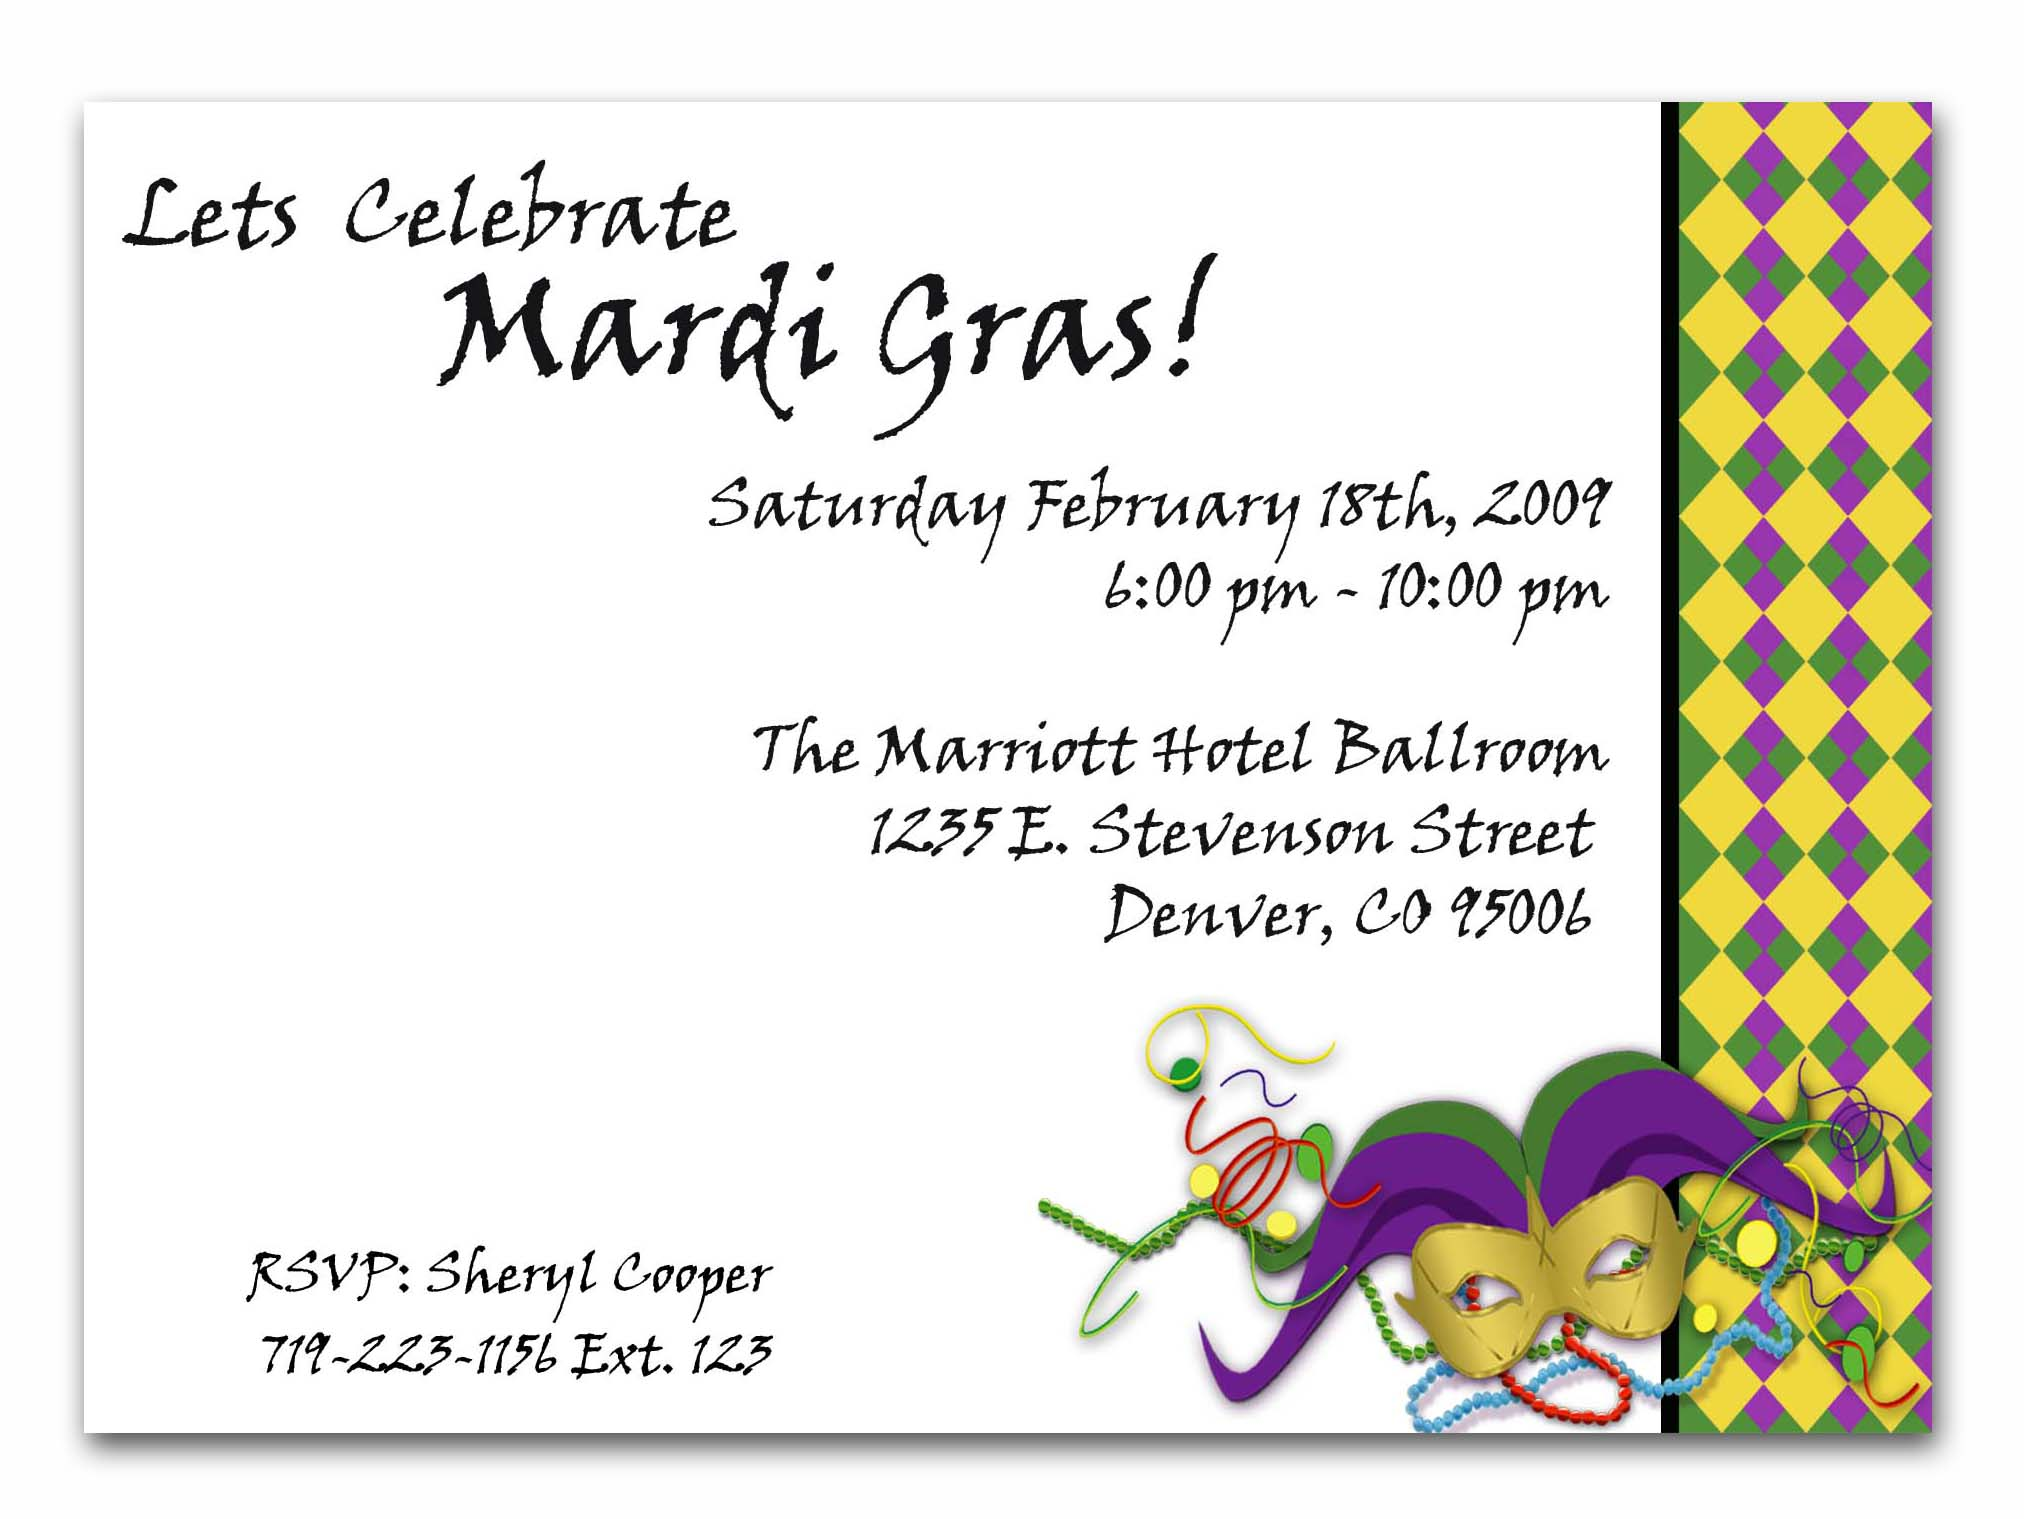 Mardi Gras Party Invitations Templates jacquie lawson birthday cards – Mardi Gras Party Invitations Templates